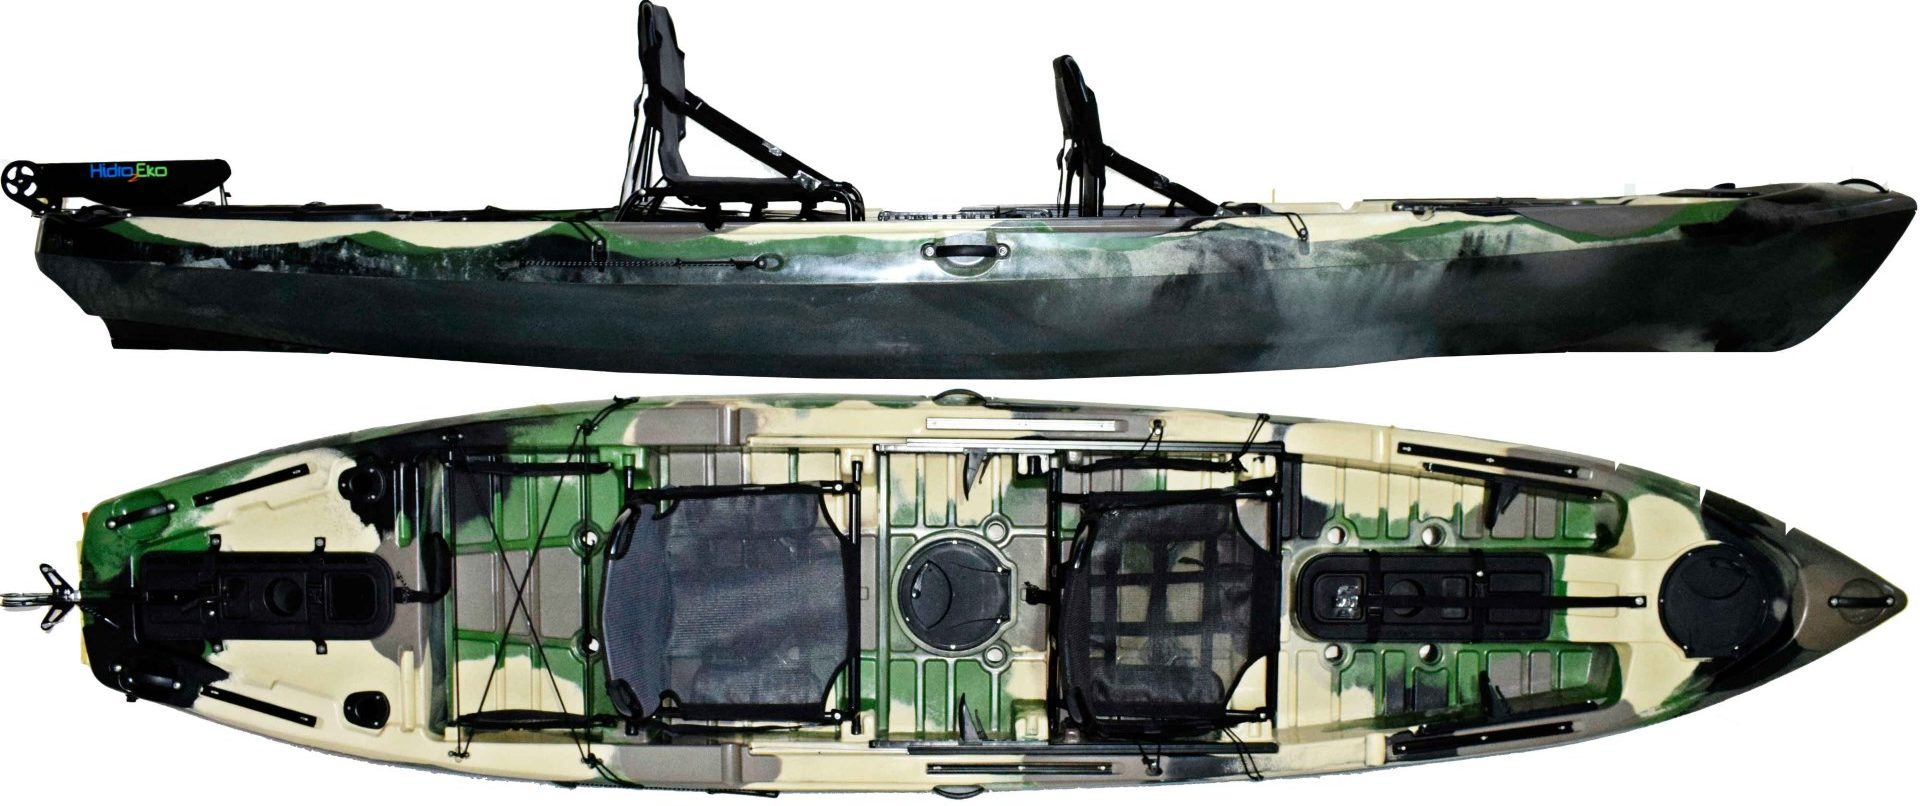 Caiaque Caiman 135 (Duplo)